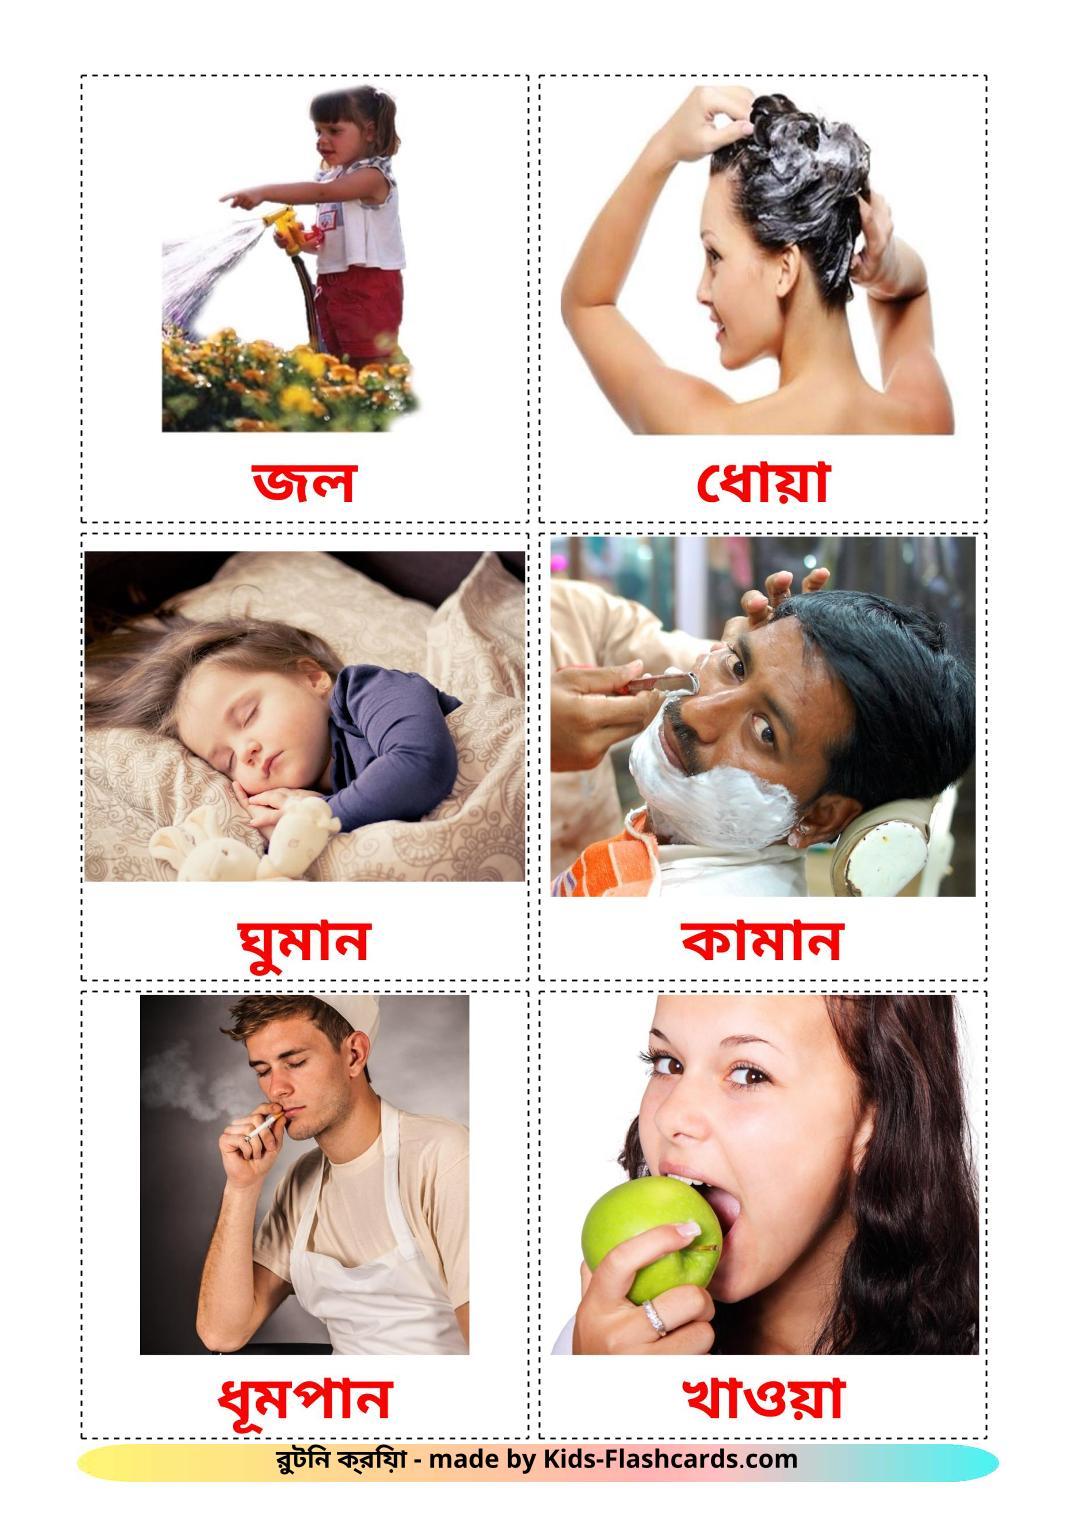 Routine verbs - 33 Free Printable bengali Flashcards